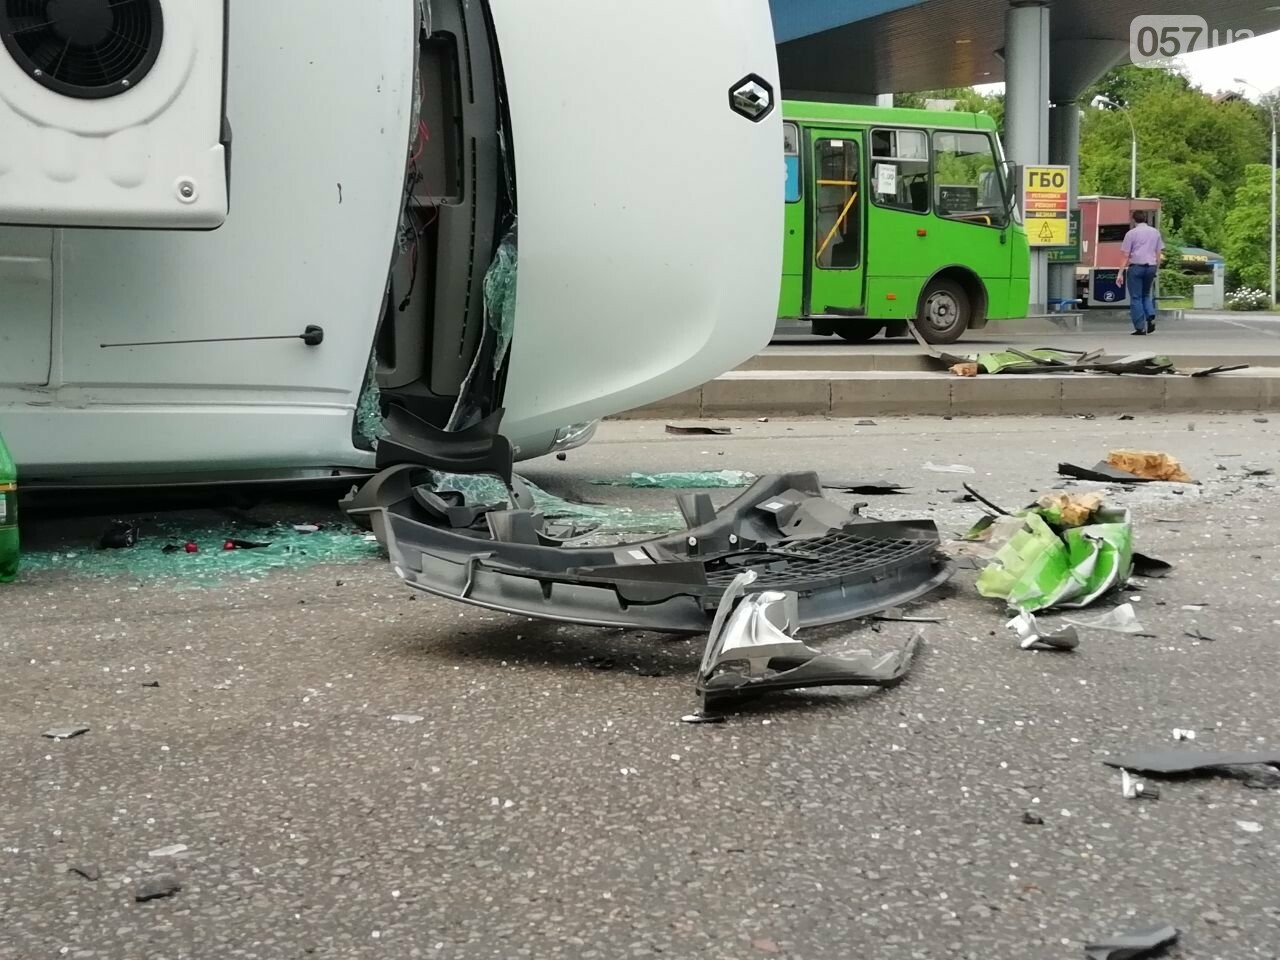 «Все сидели в крови»: подробности аварии на проспекте Тракторостроителей, - ФОТО, ВИДЕО, фото-3